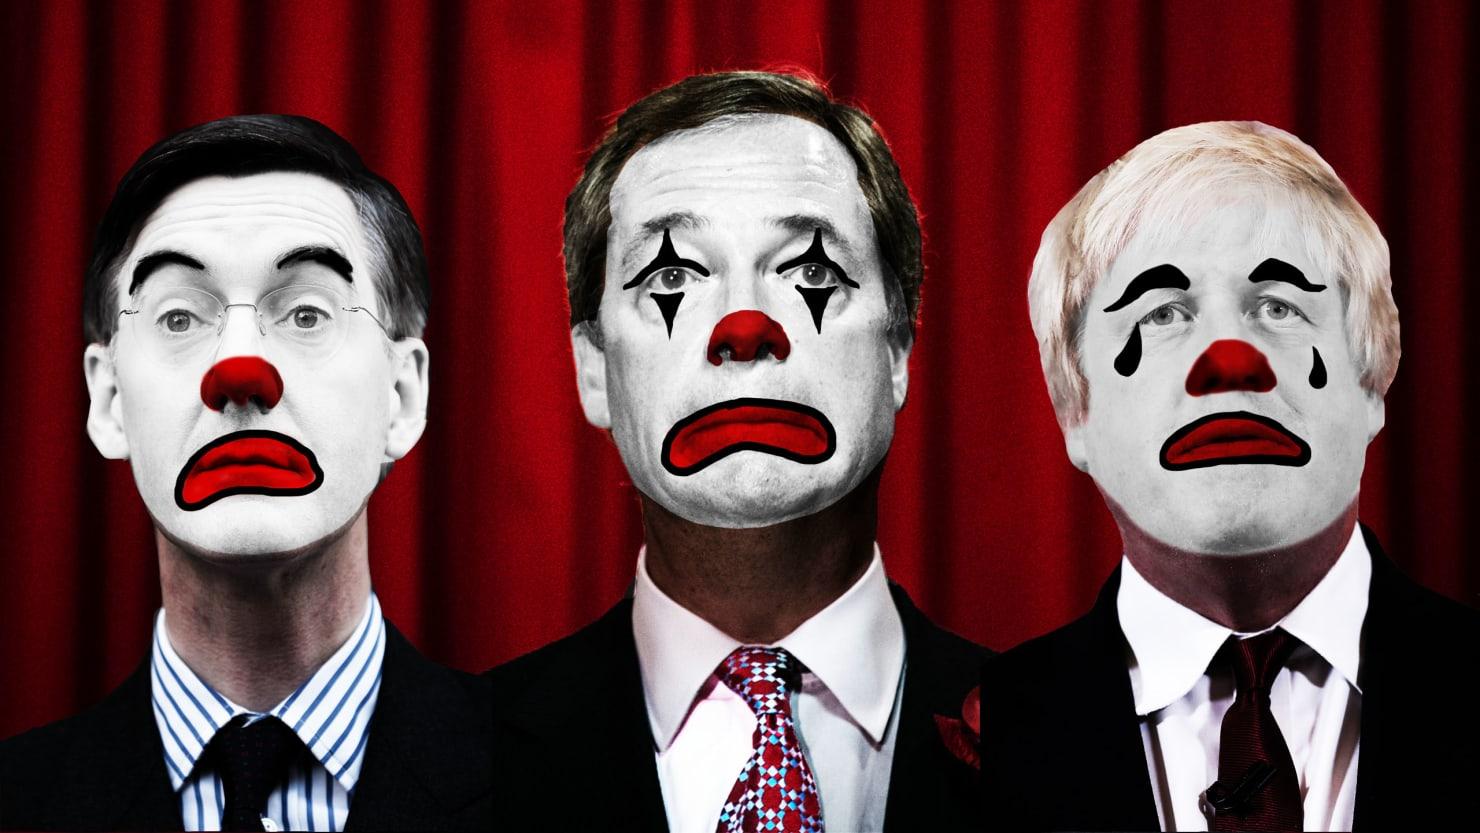 Nigel Farage, Boris Johnson, Jacob Rees-Mogg: The Three ...